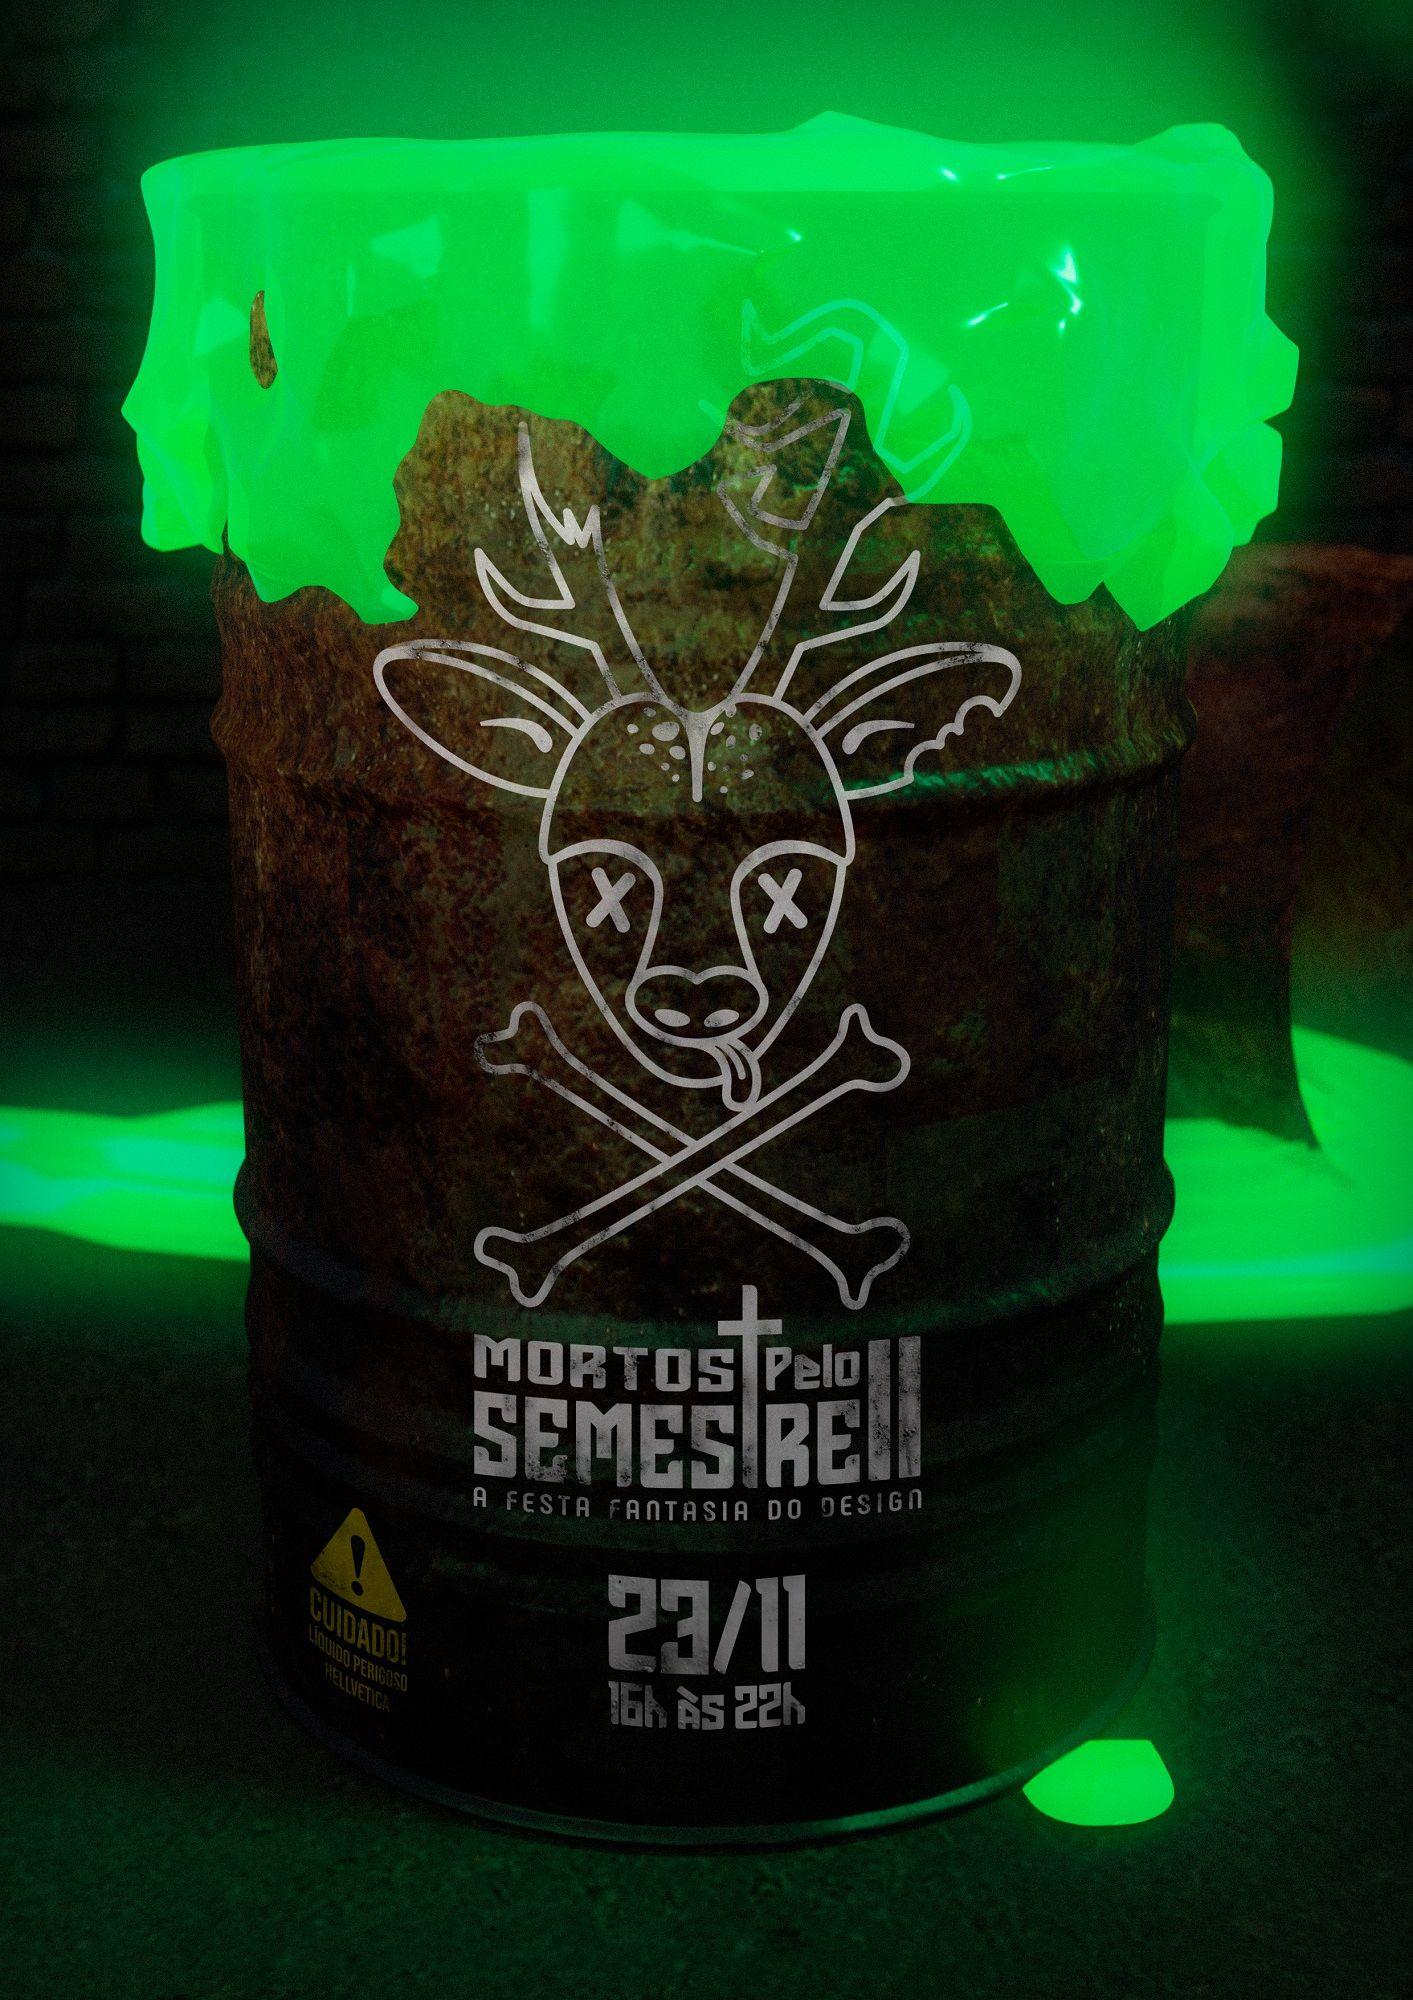 #Toxic #Cartaz #Banner #Party #Festa #Divulgação #Graphicdesign #Designgráfico #Glow #Green #Slime #3Dmodel #3D #Blender #Photoshop